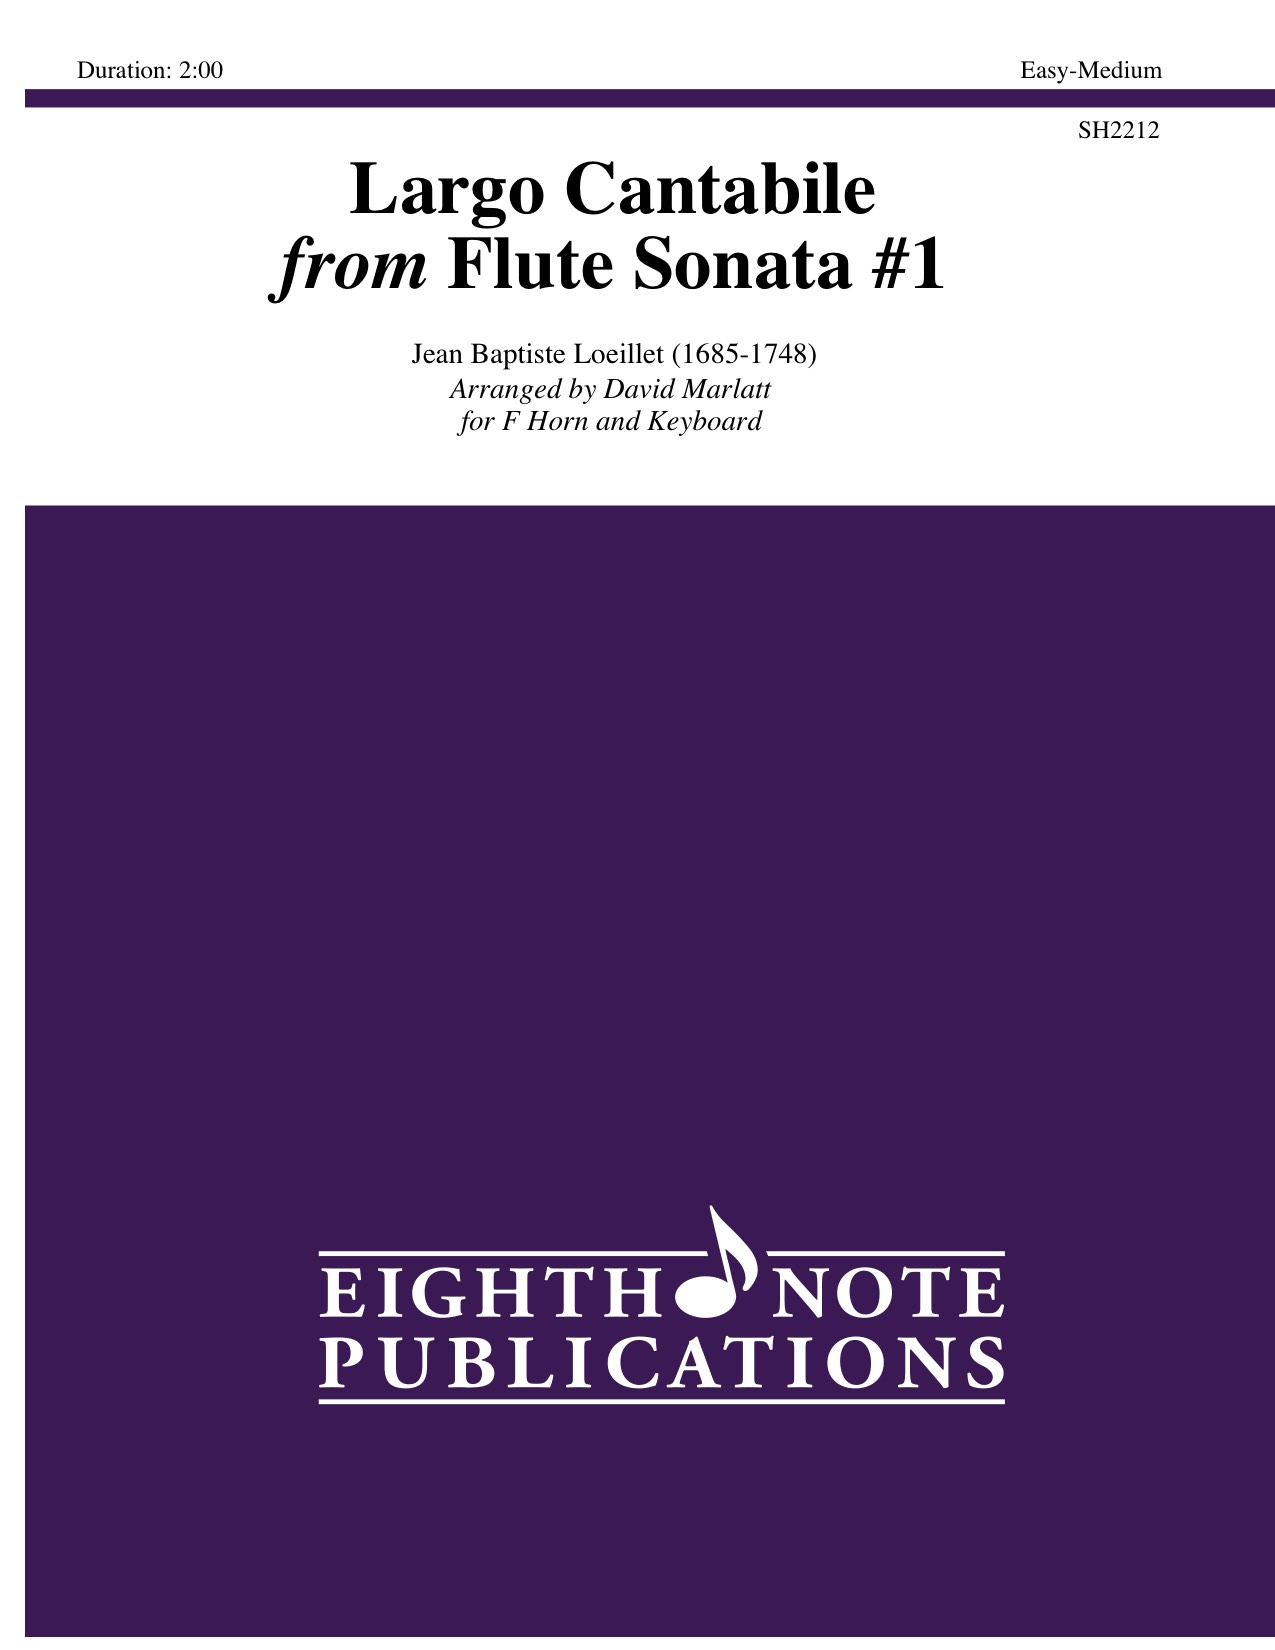 Largo Cantabile from Flute Sonata #1  - Jean Baptiste Loeillet